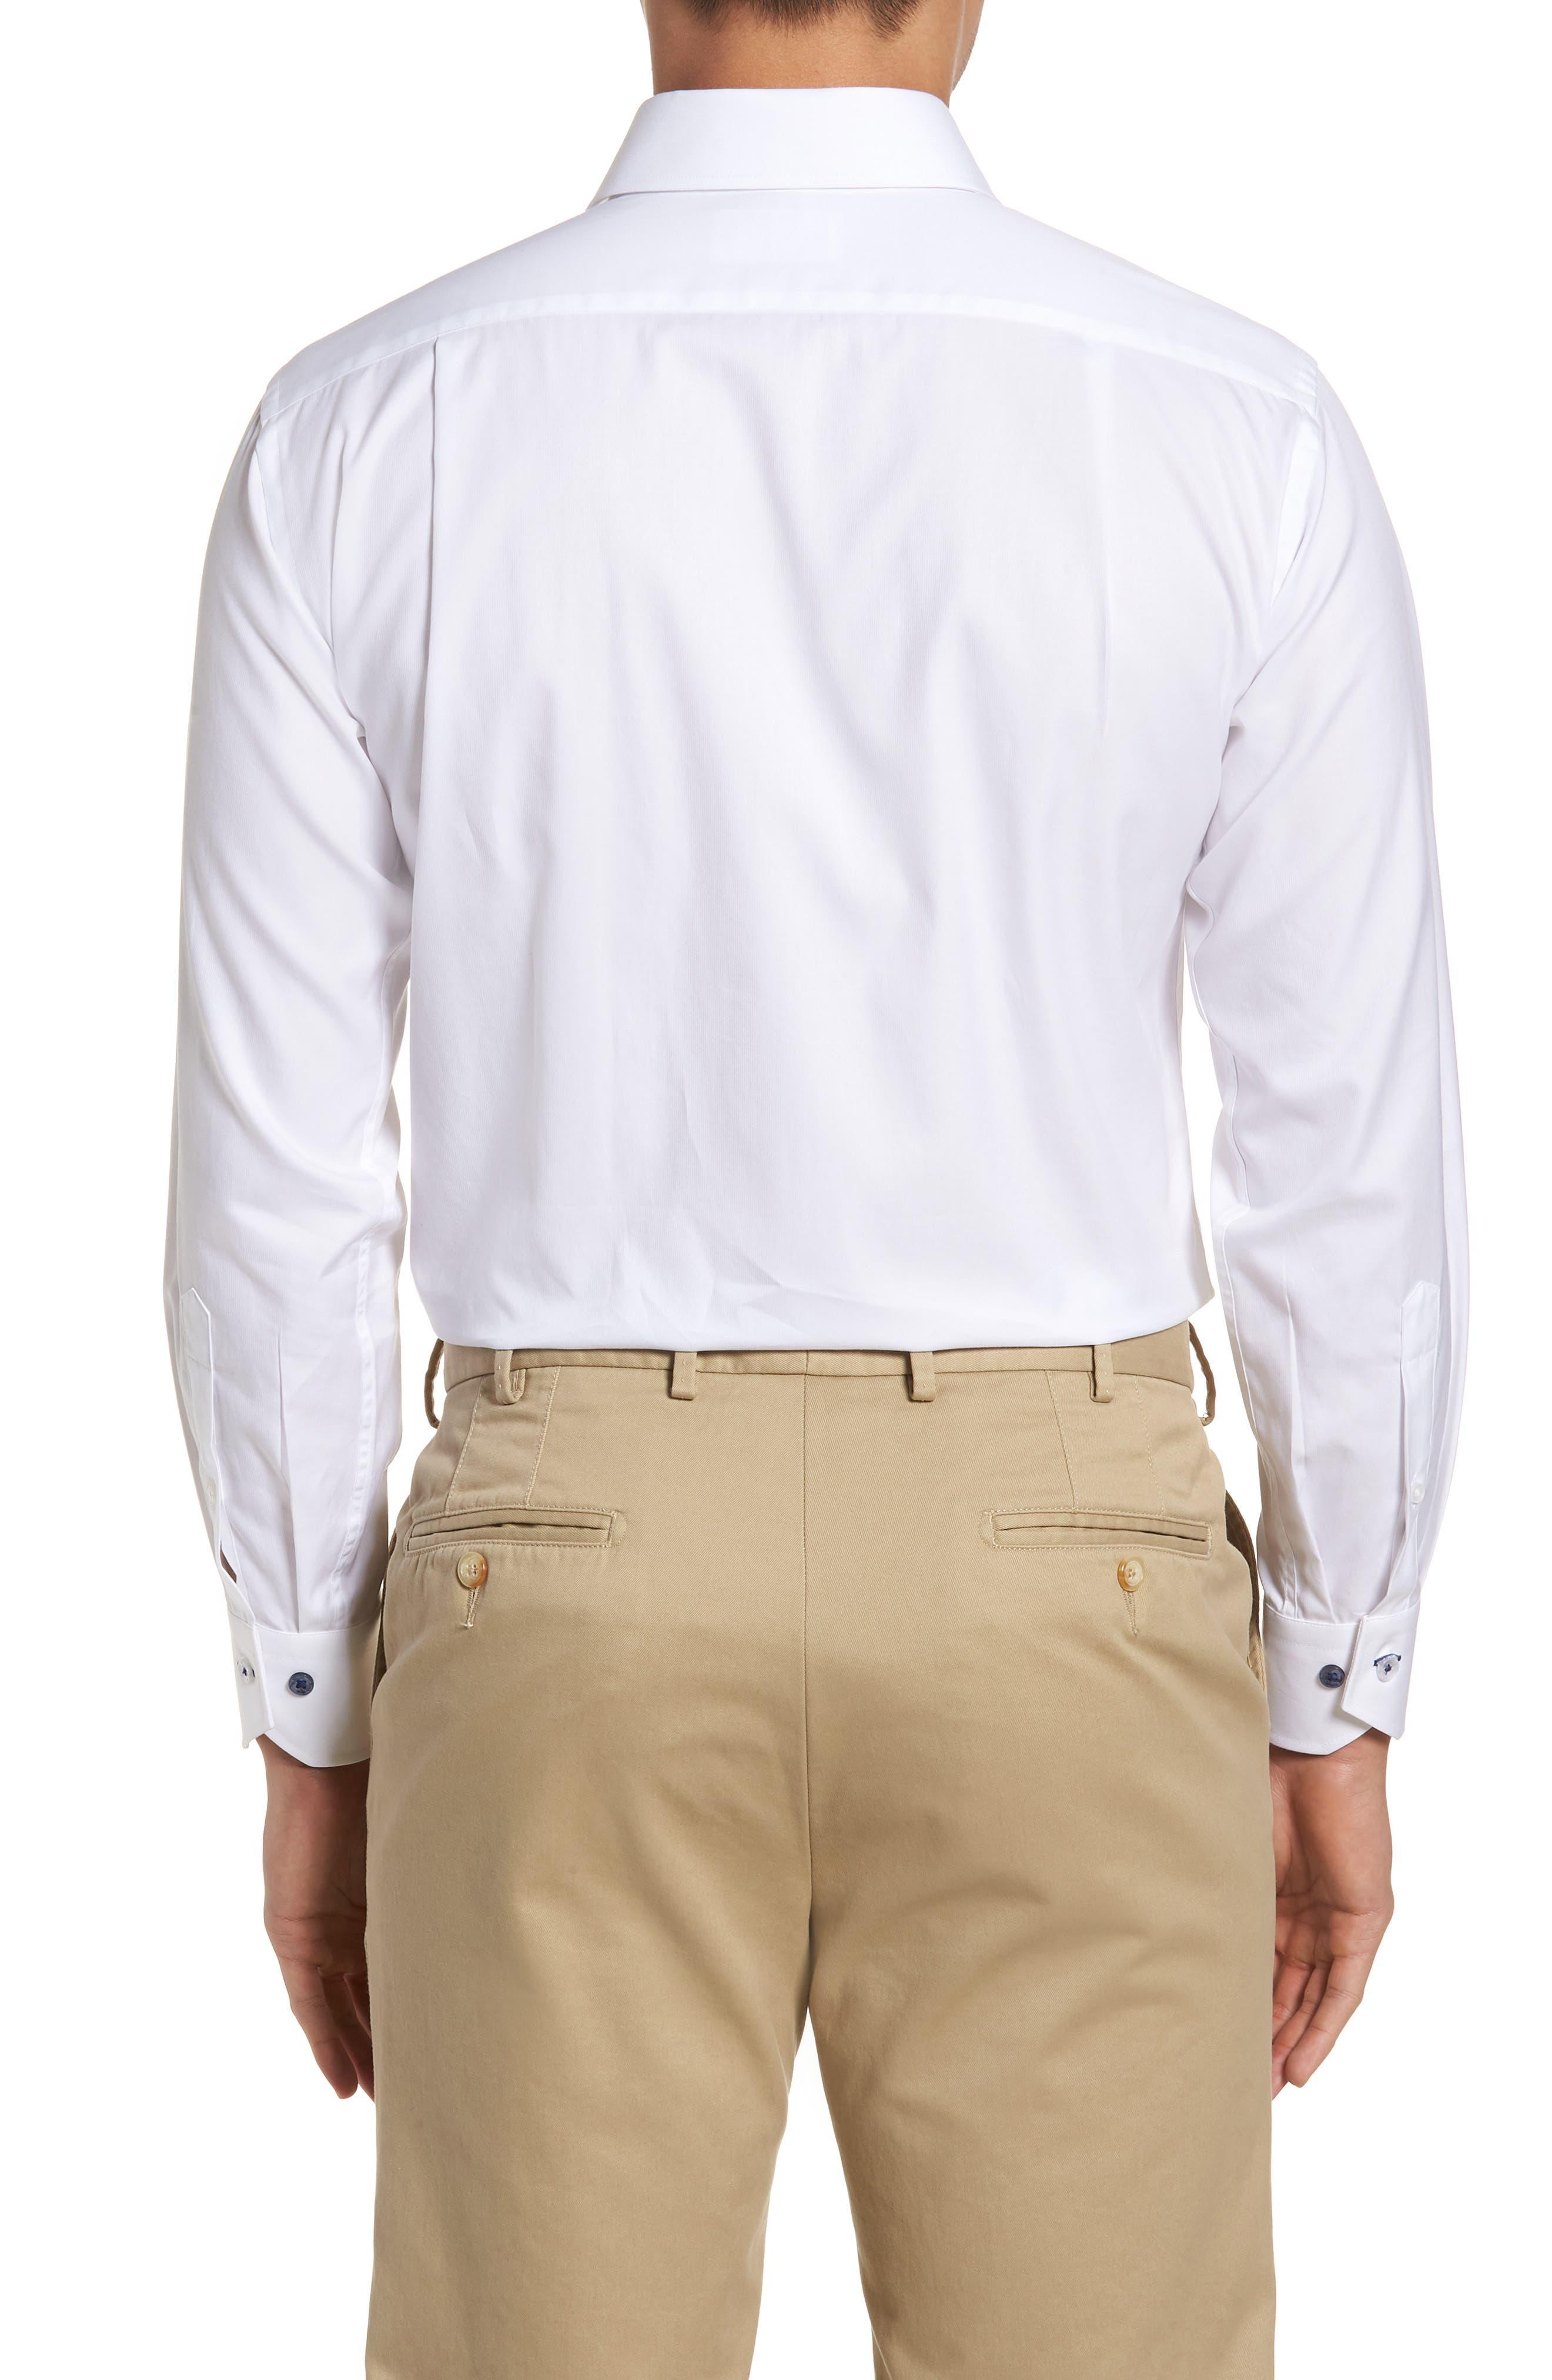 LORENZO UOMO, Trim Fit Solid Dress Shirt, Alternate thumbnail 3, color, WHITE